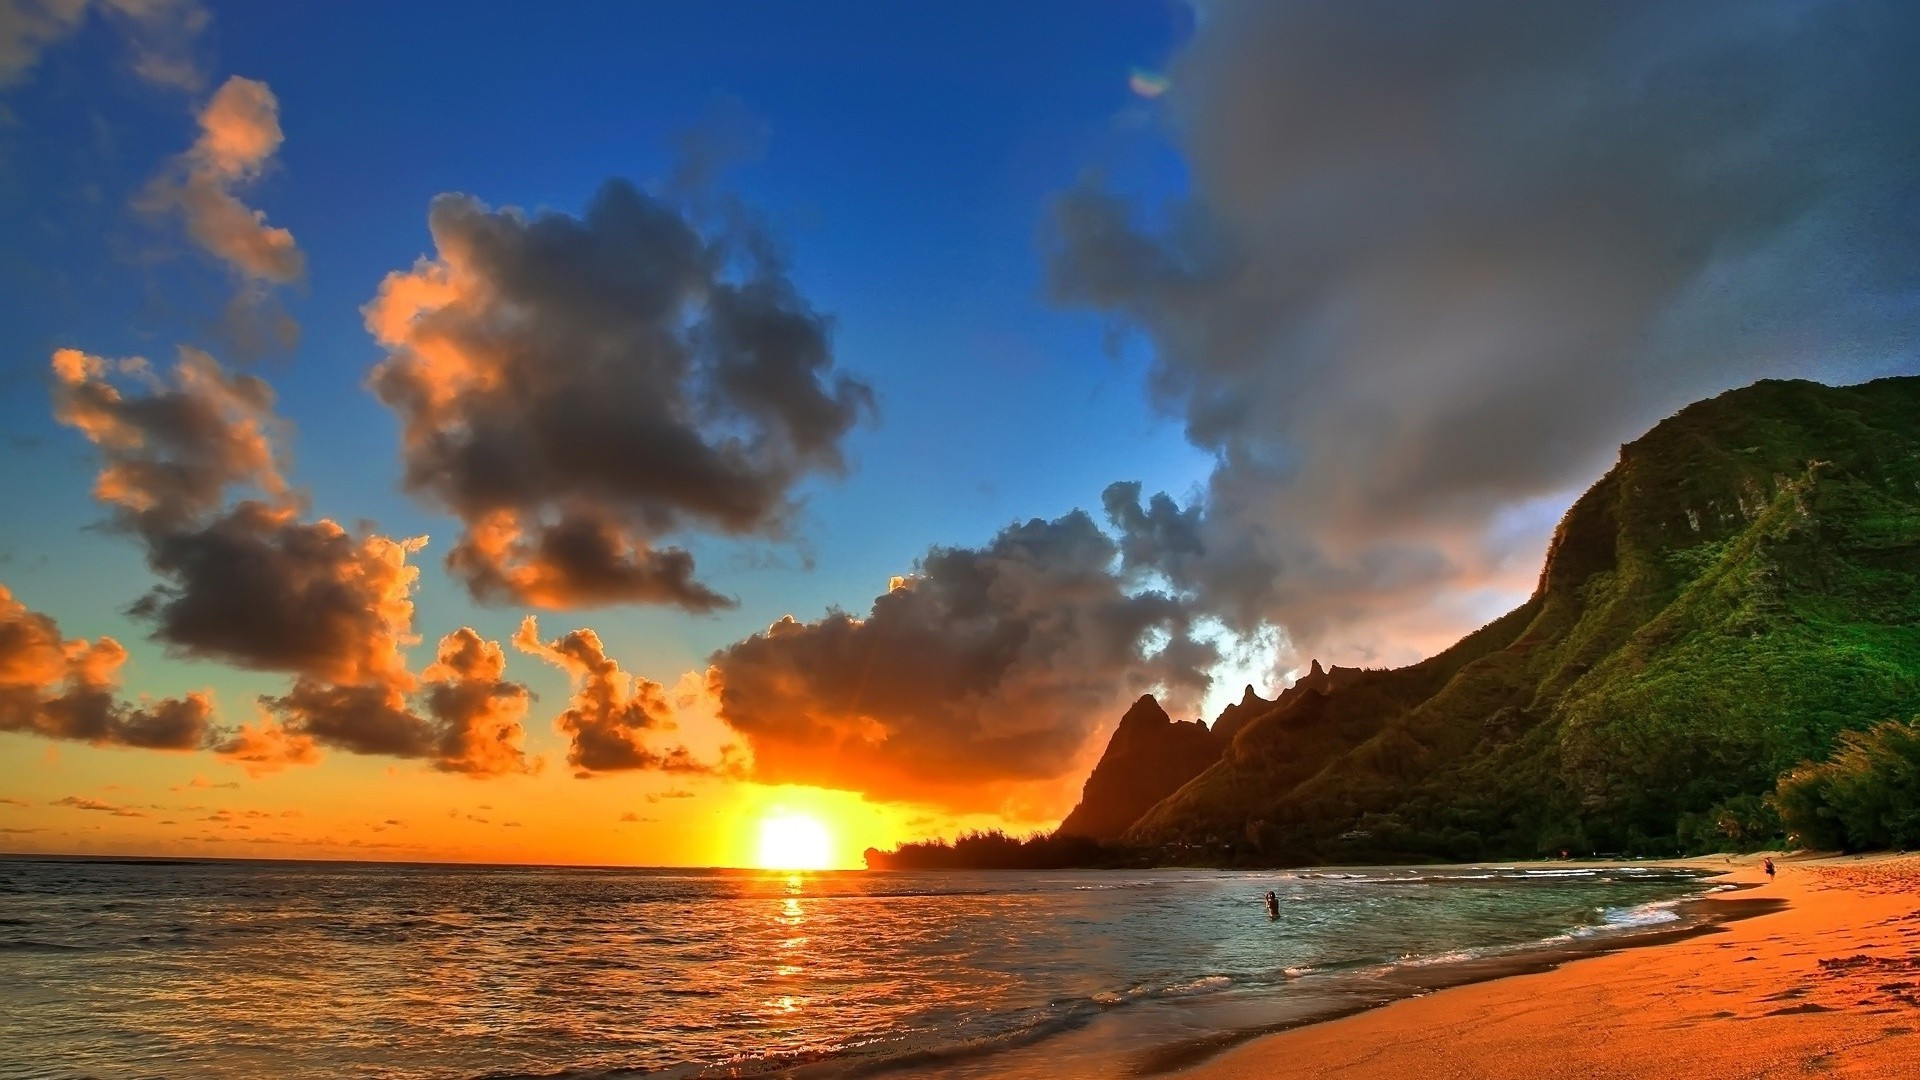 Wallpapers Beach Sunset 1080p For Desktop High Definition Wallpapers 1920x1080